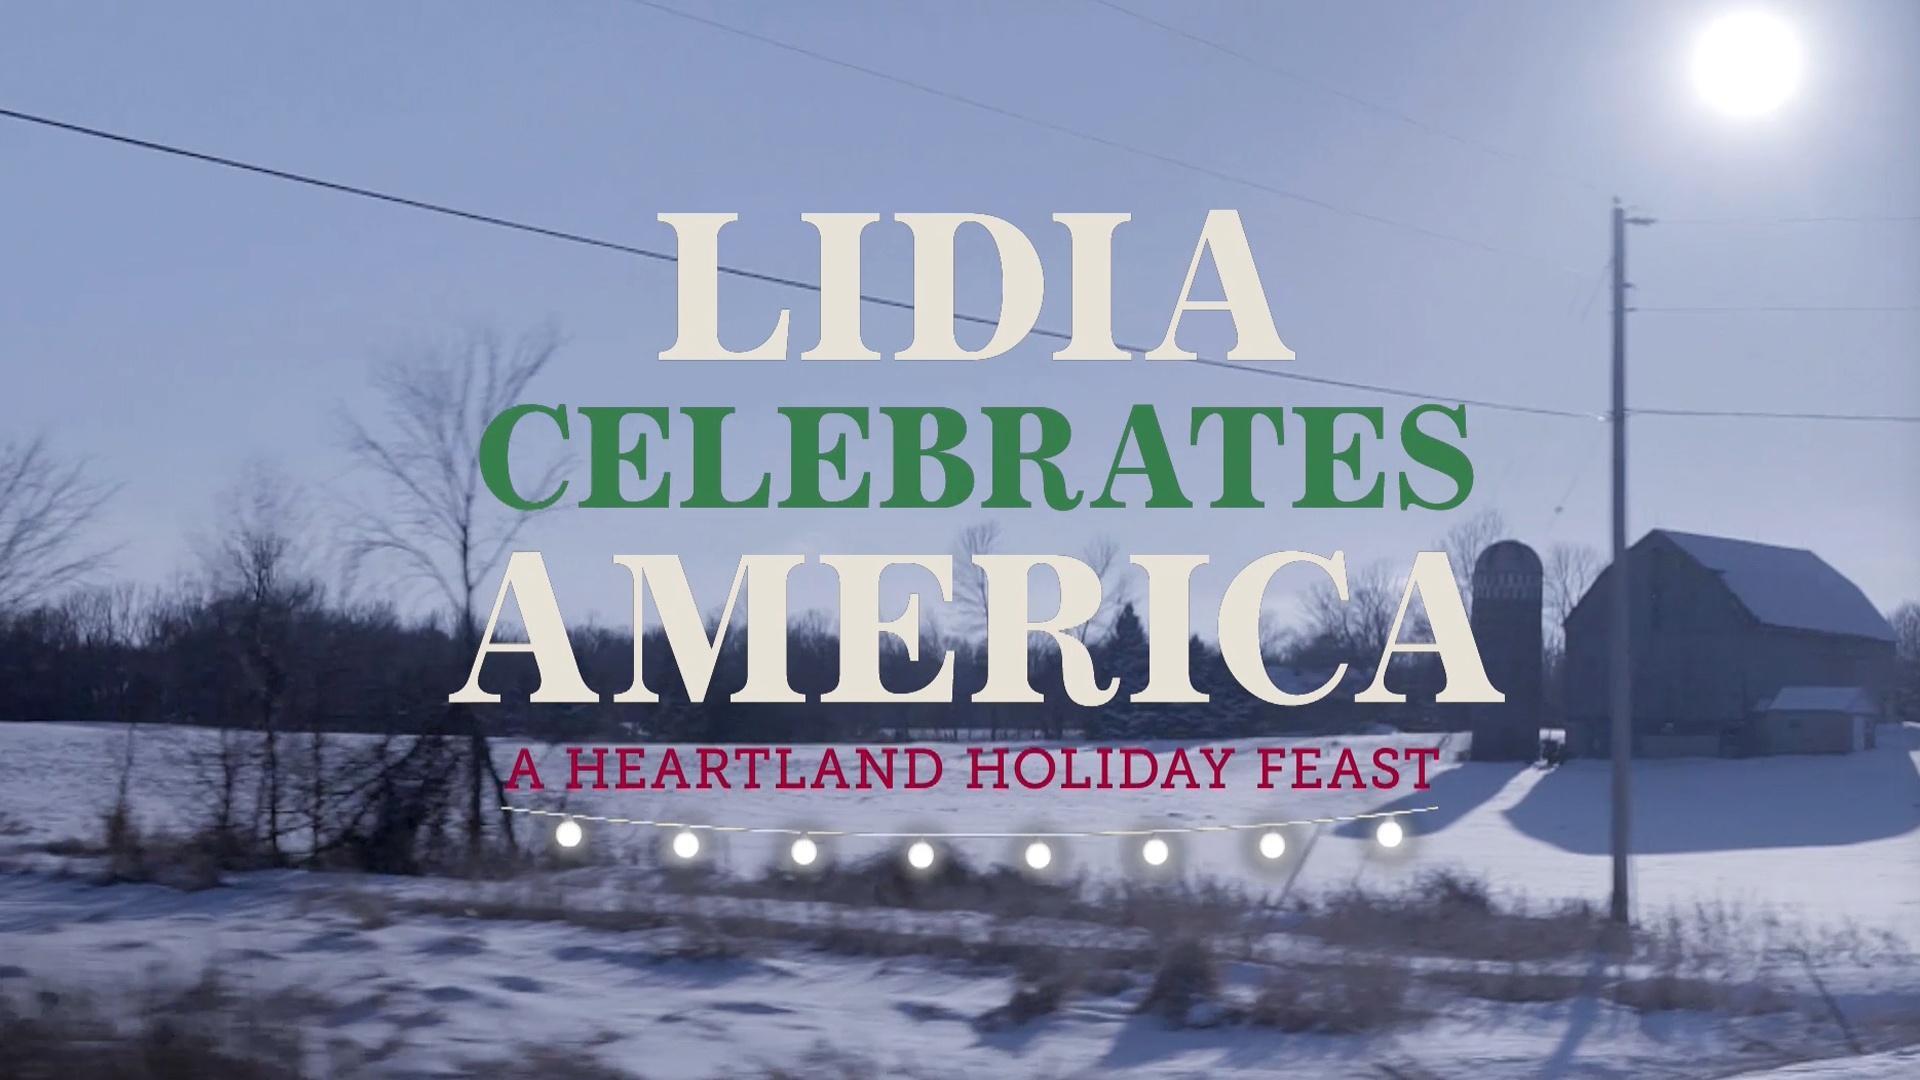 Lidia Celebrates America: A Heartland Holiday Feast Preview